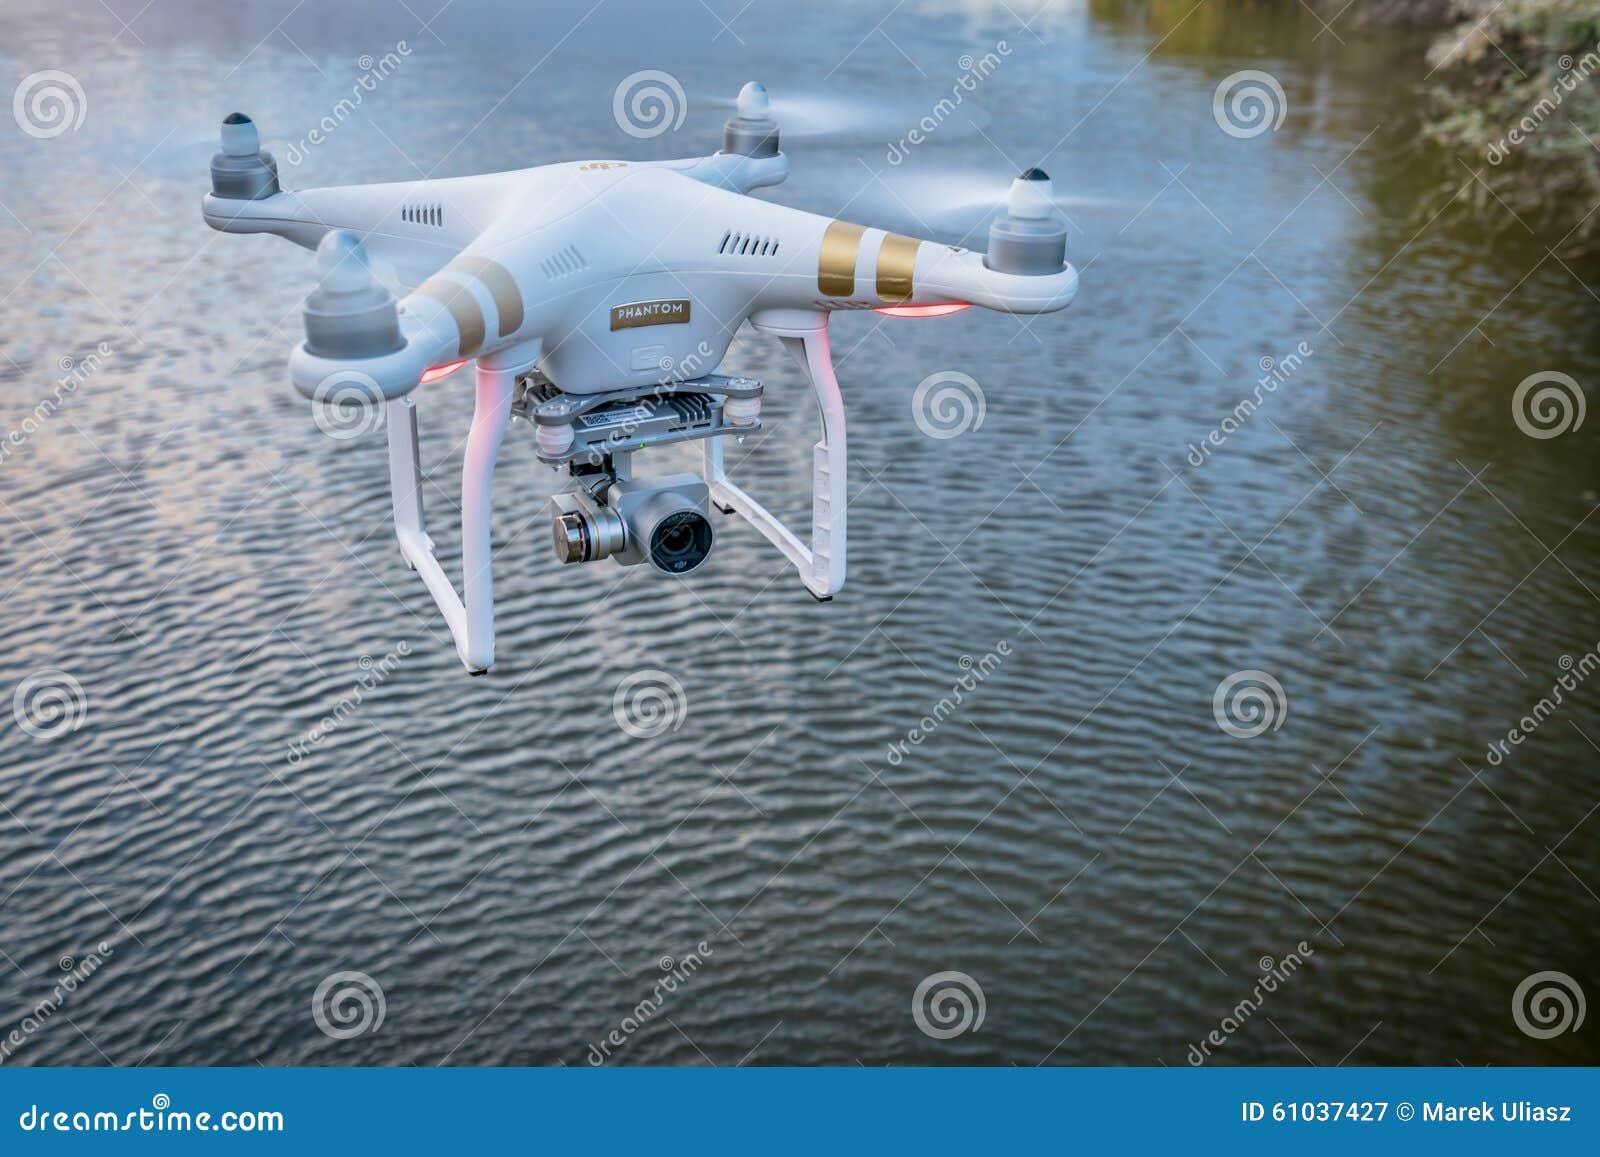 Acheter dronex pro vietnam prix drones